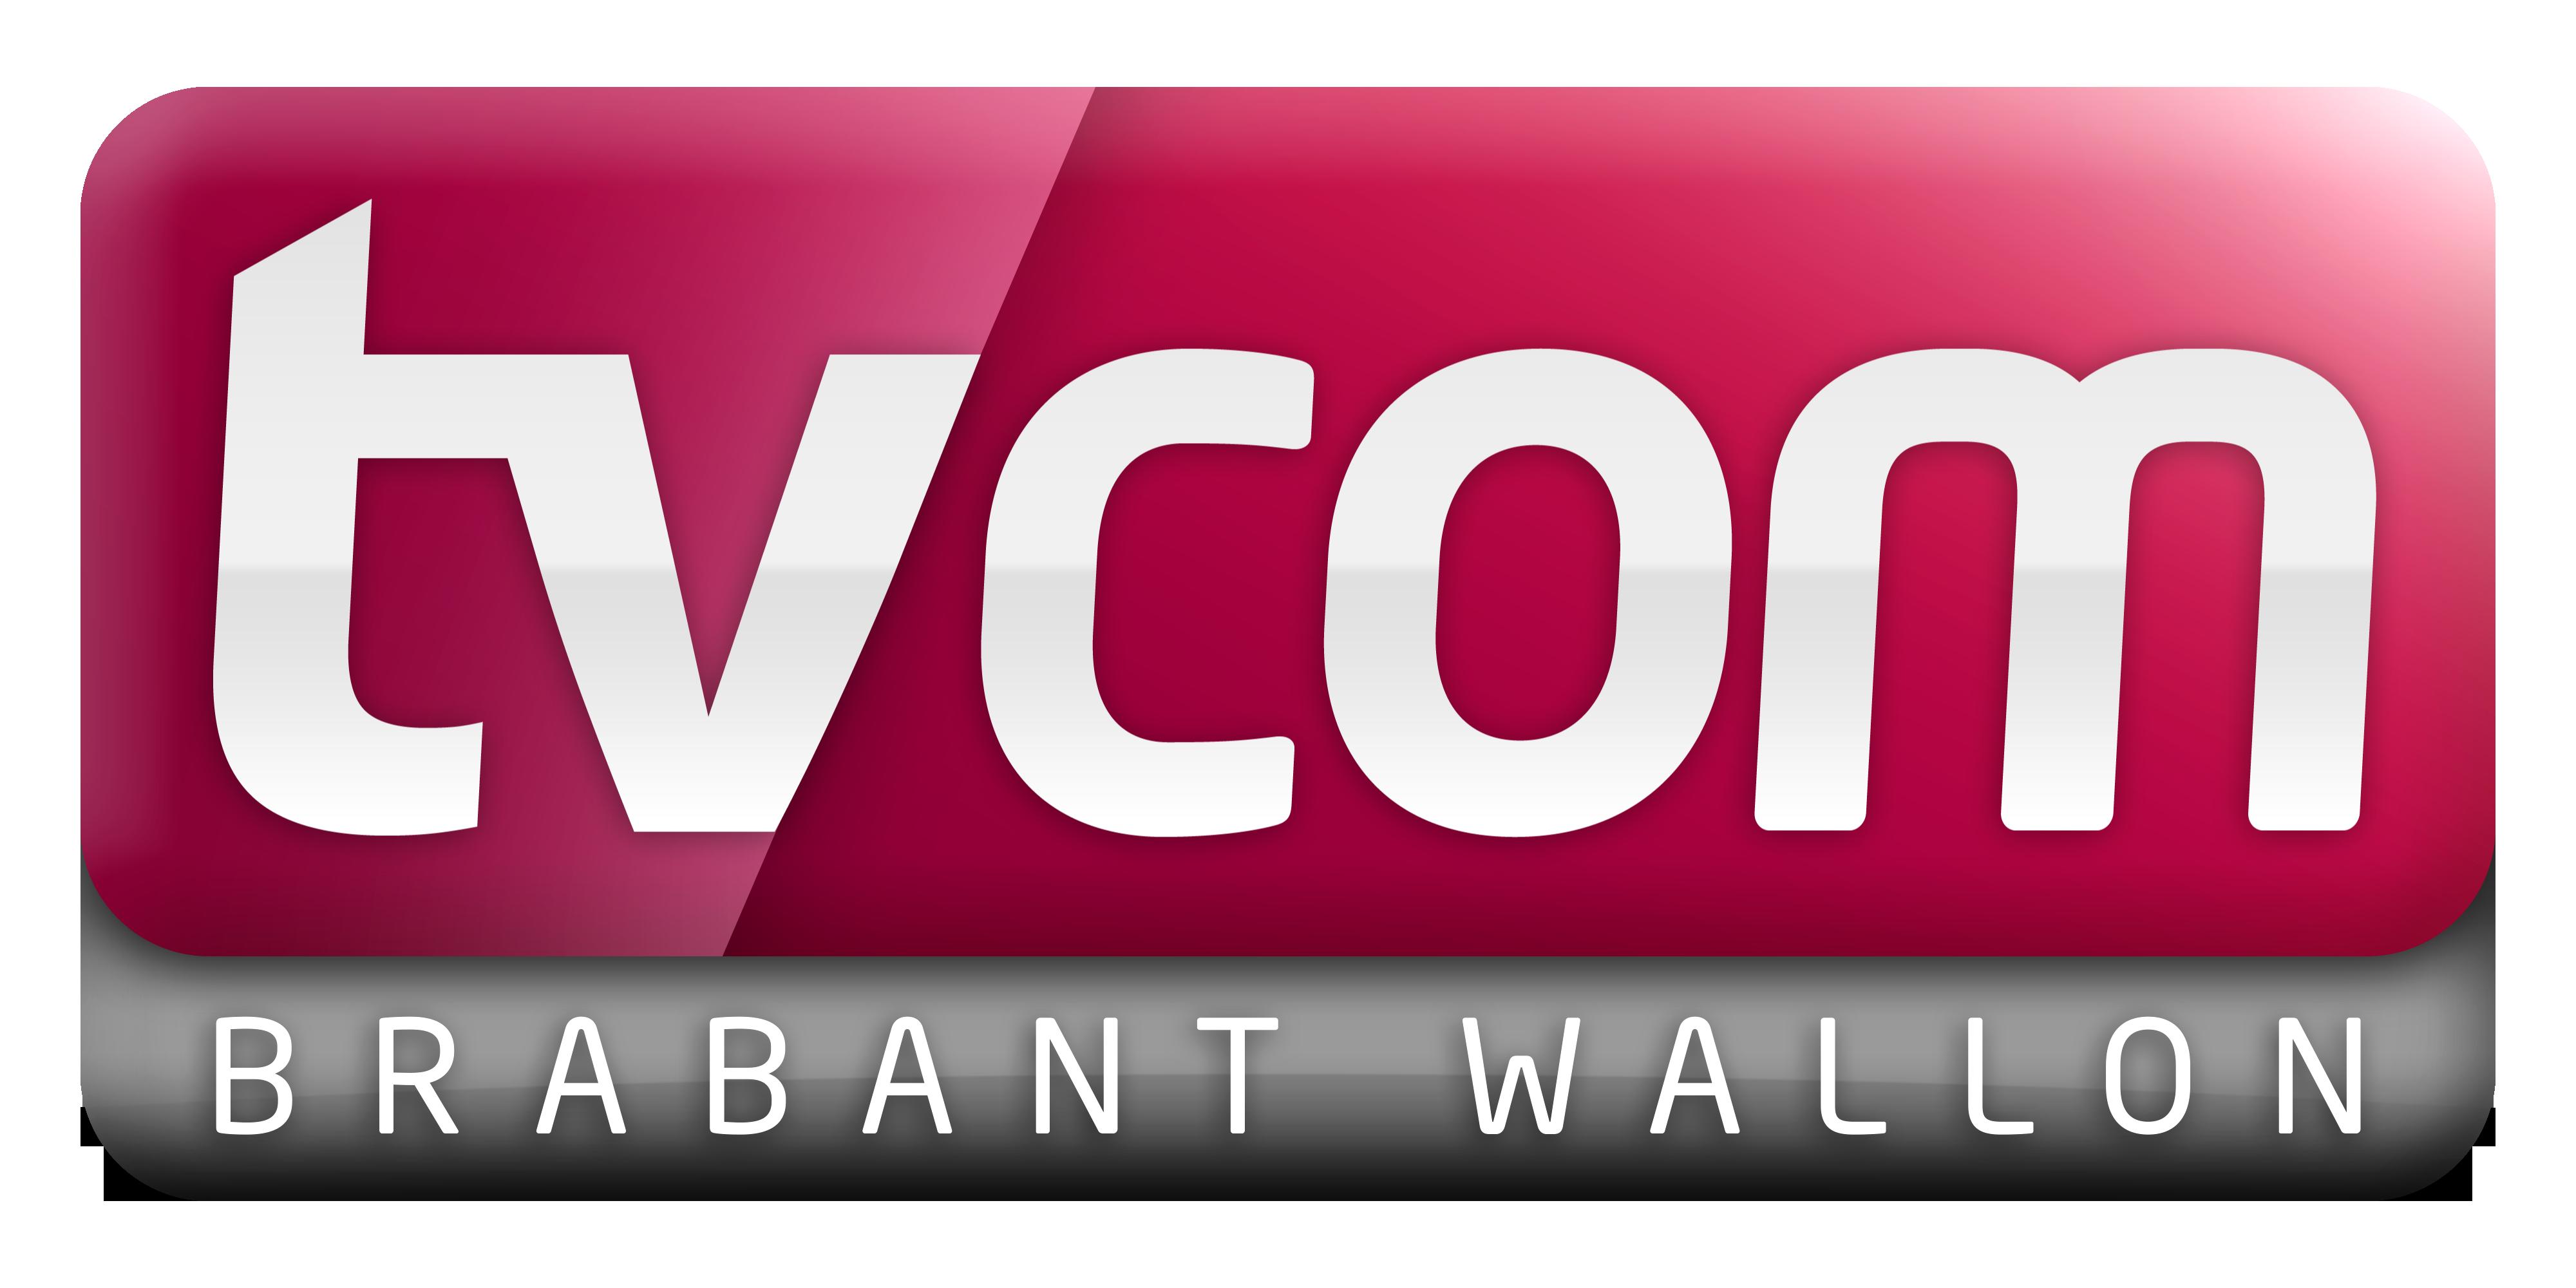 TVCOM_BW_V_RGB